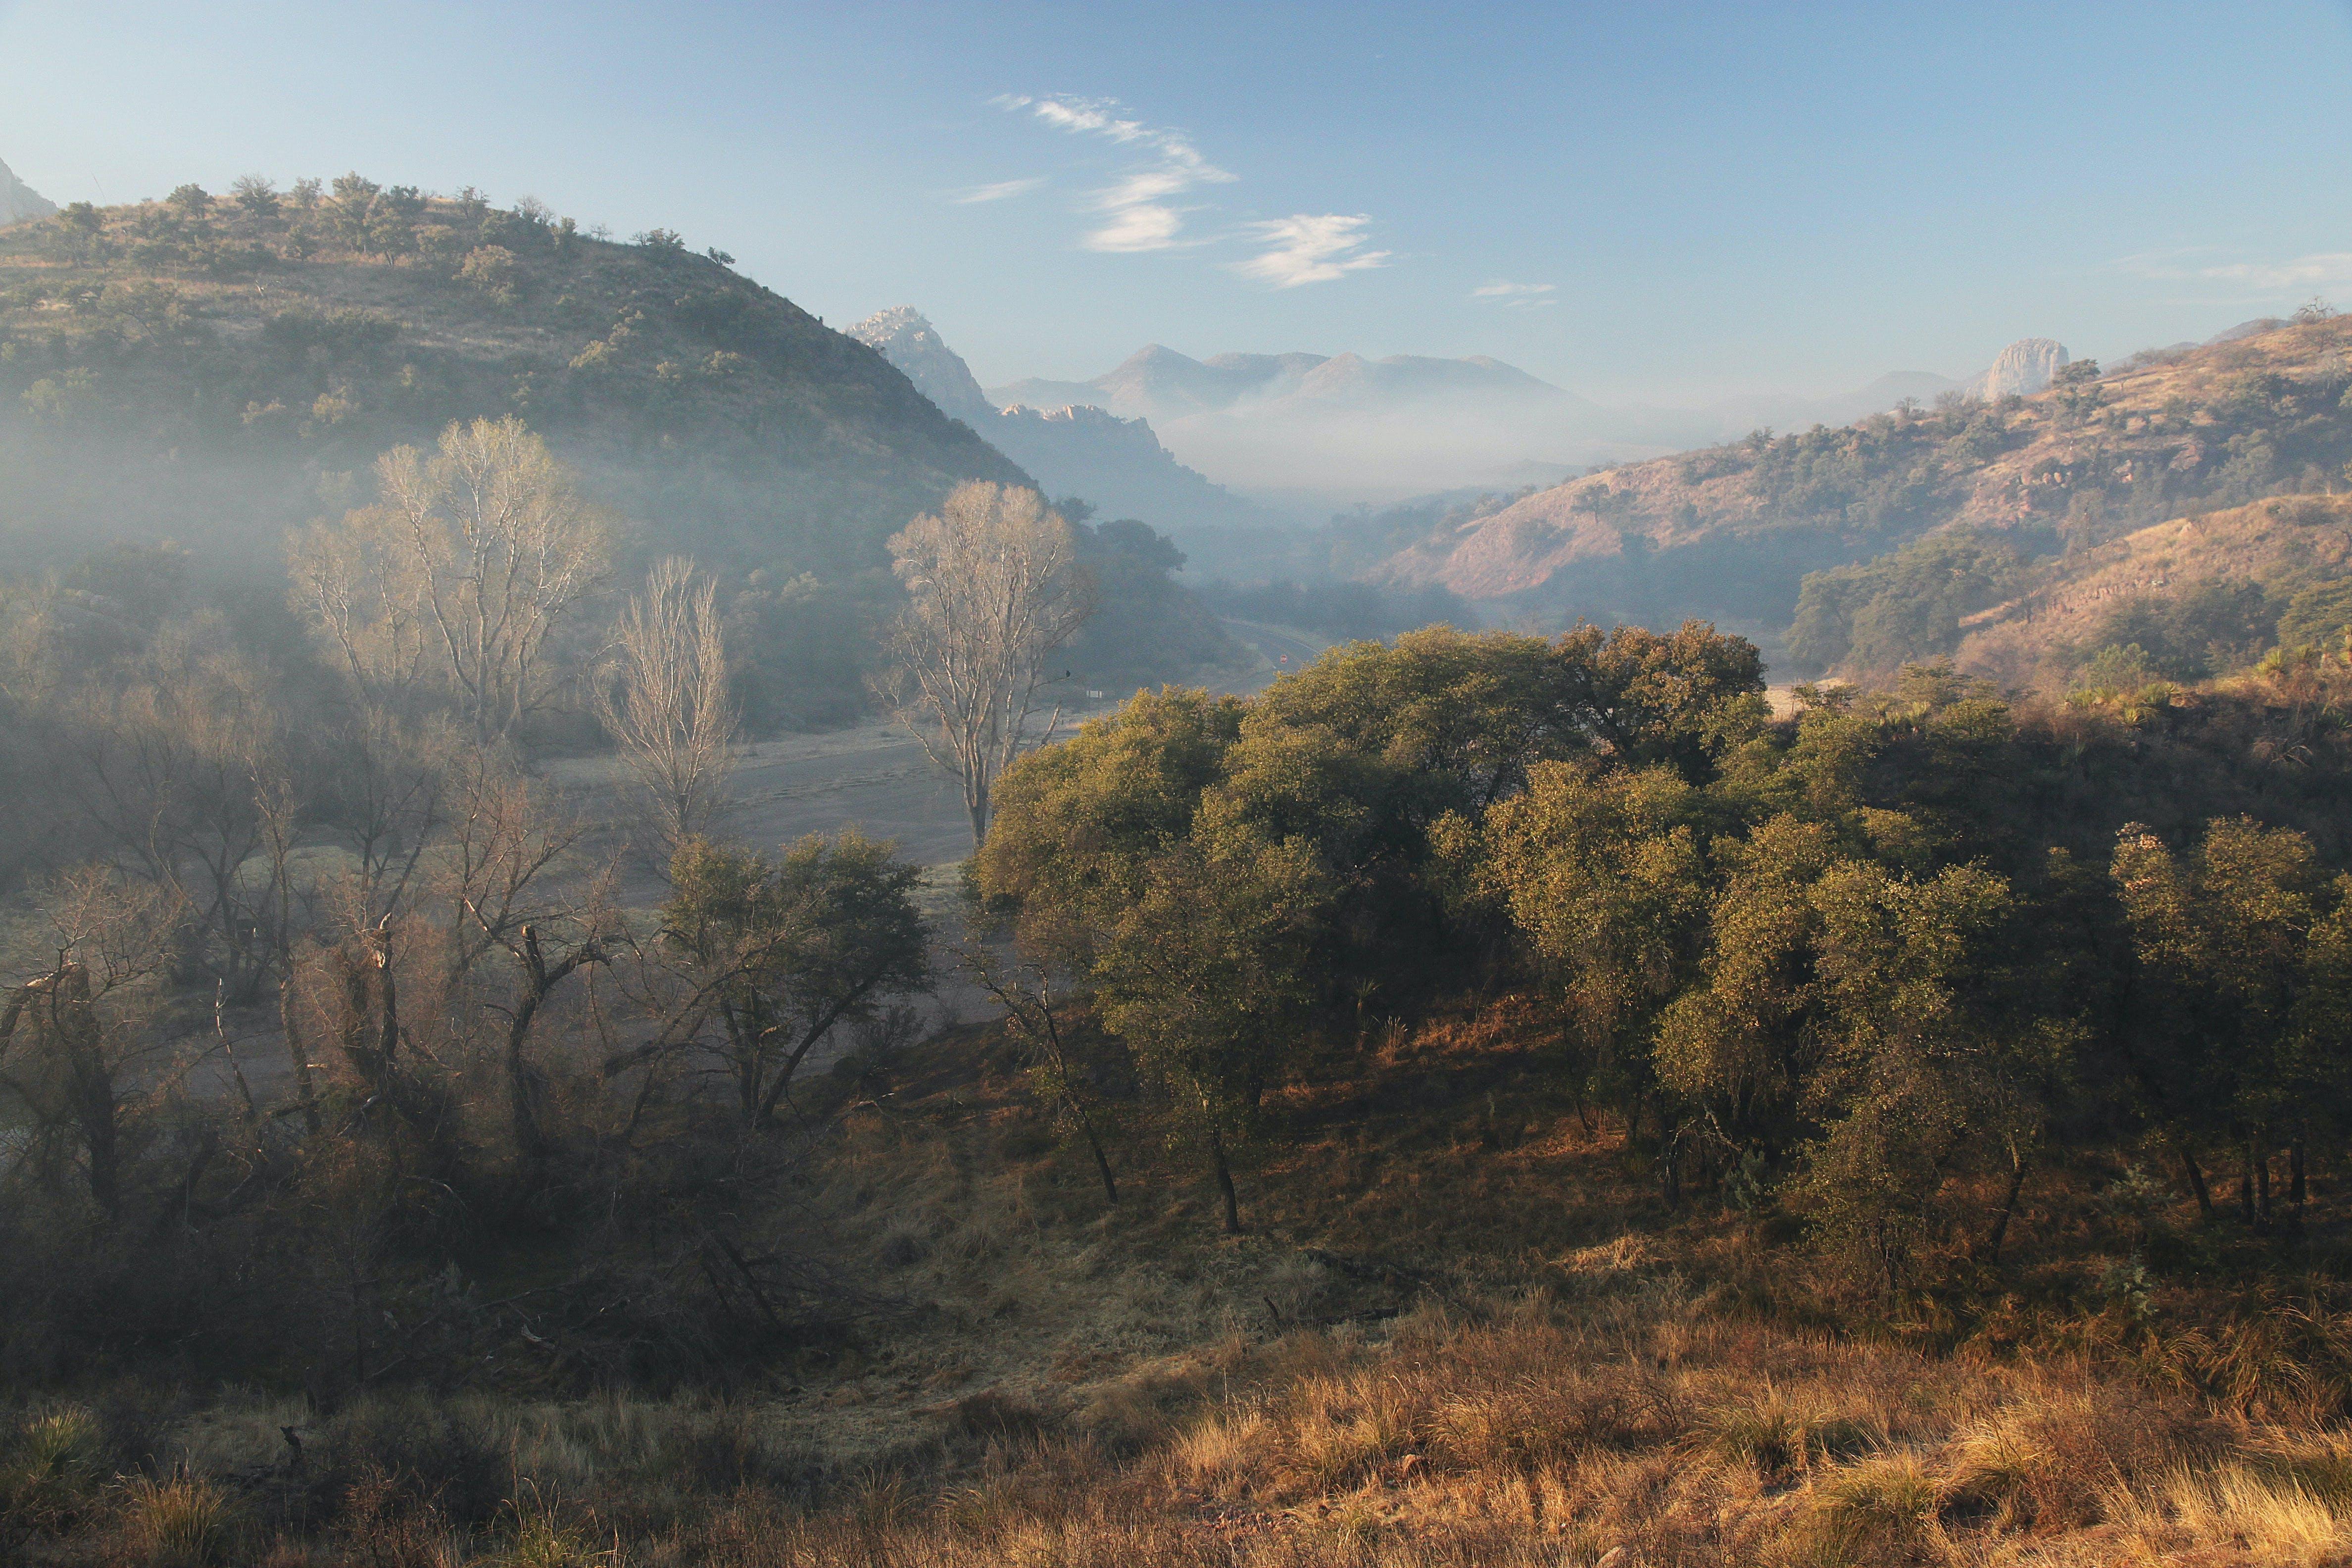 Kostenloses Stock Foto zu bäume, berg, hügel, landschaft